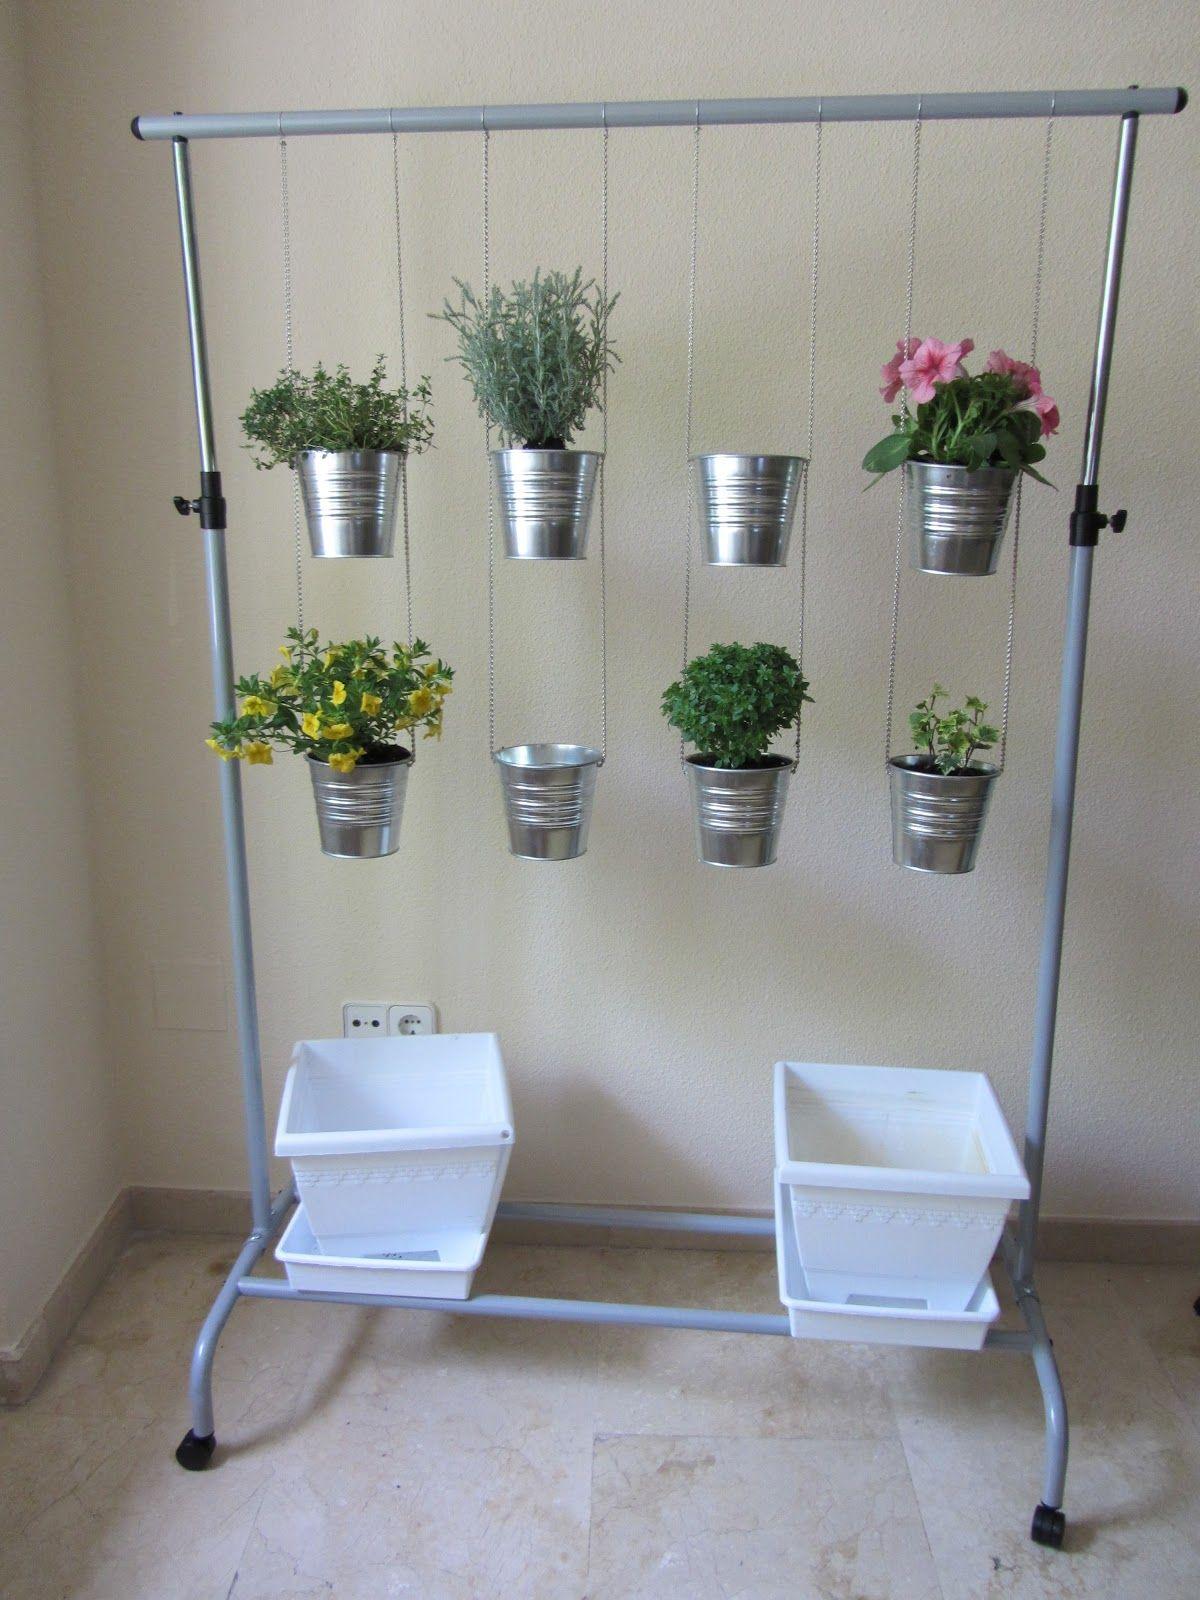 Explore Ikea Room Divider, Garden Pots, And More!